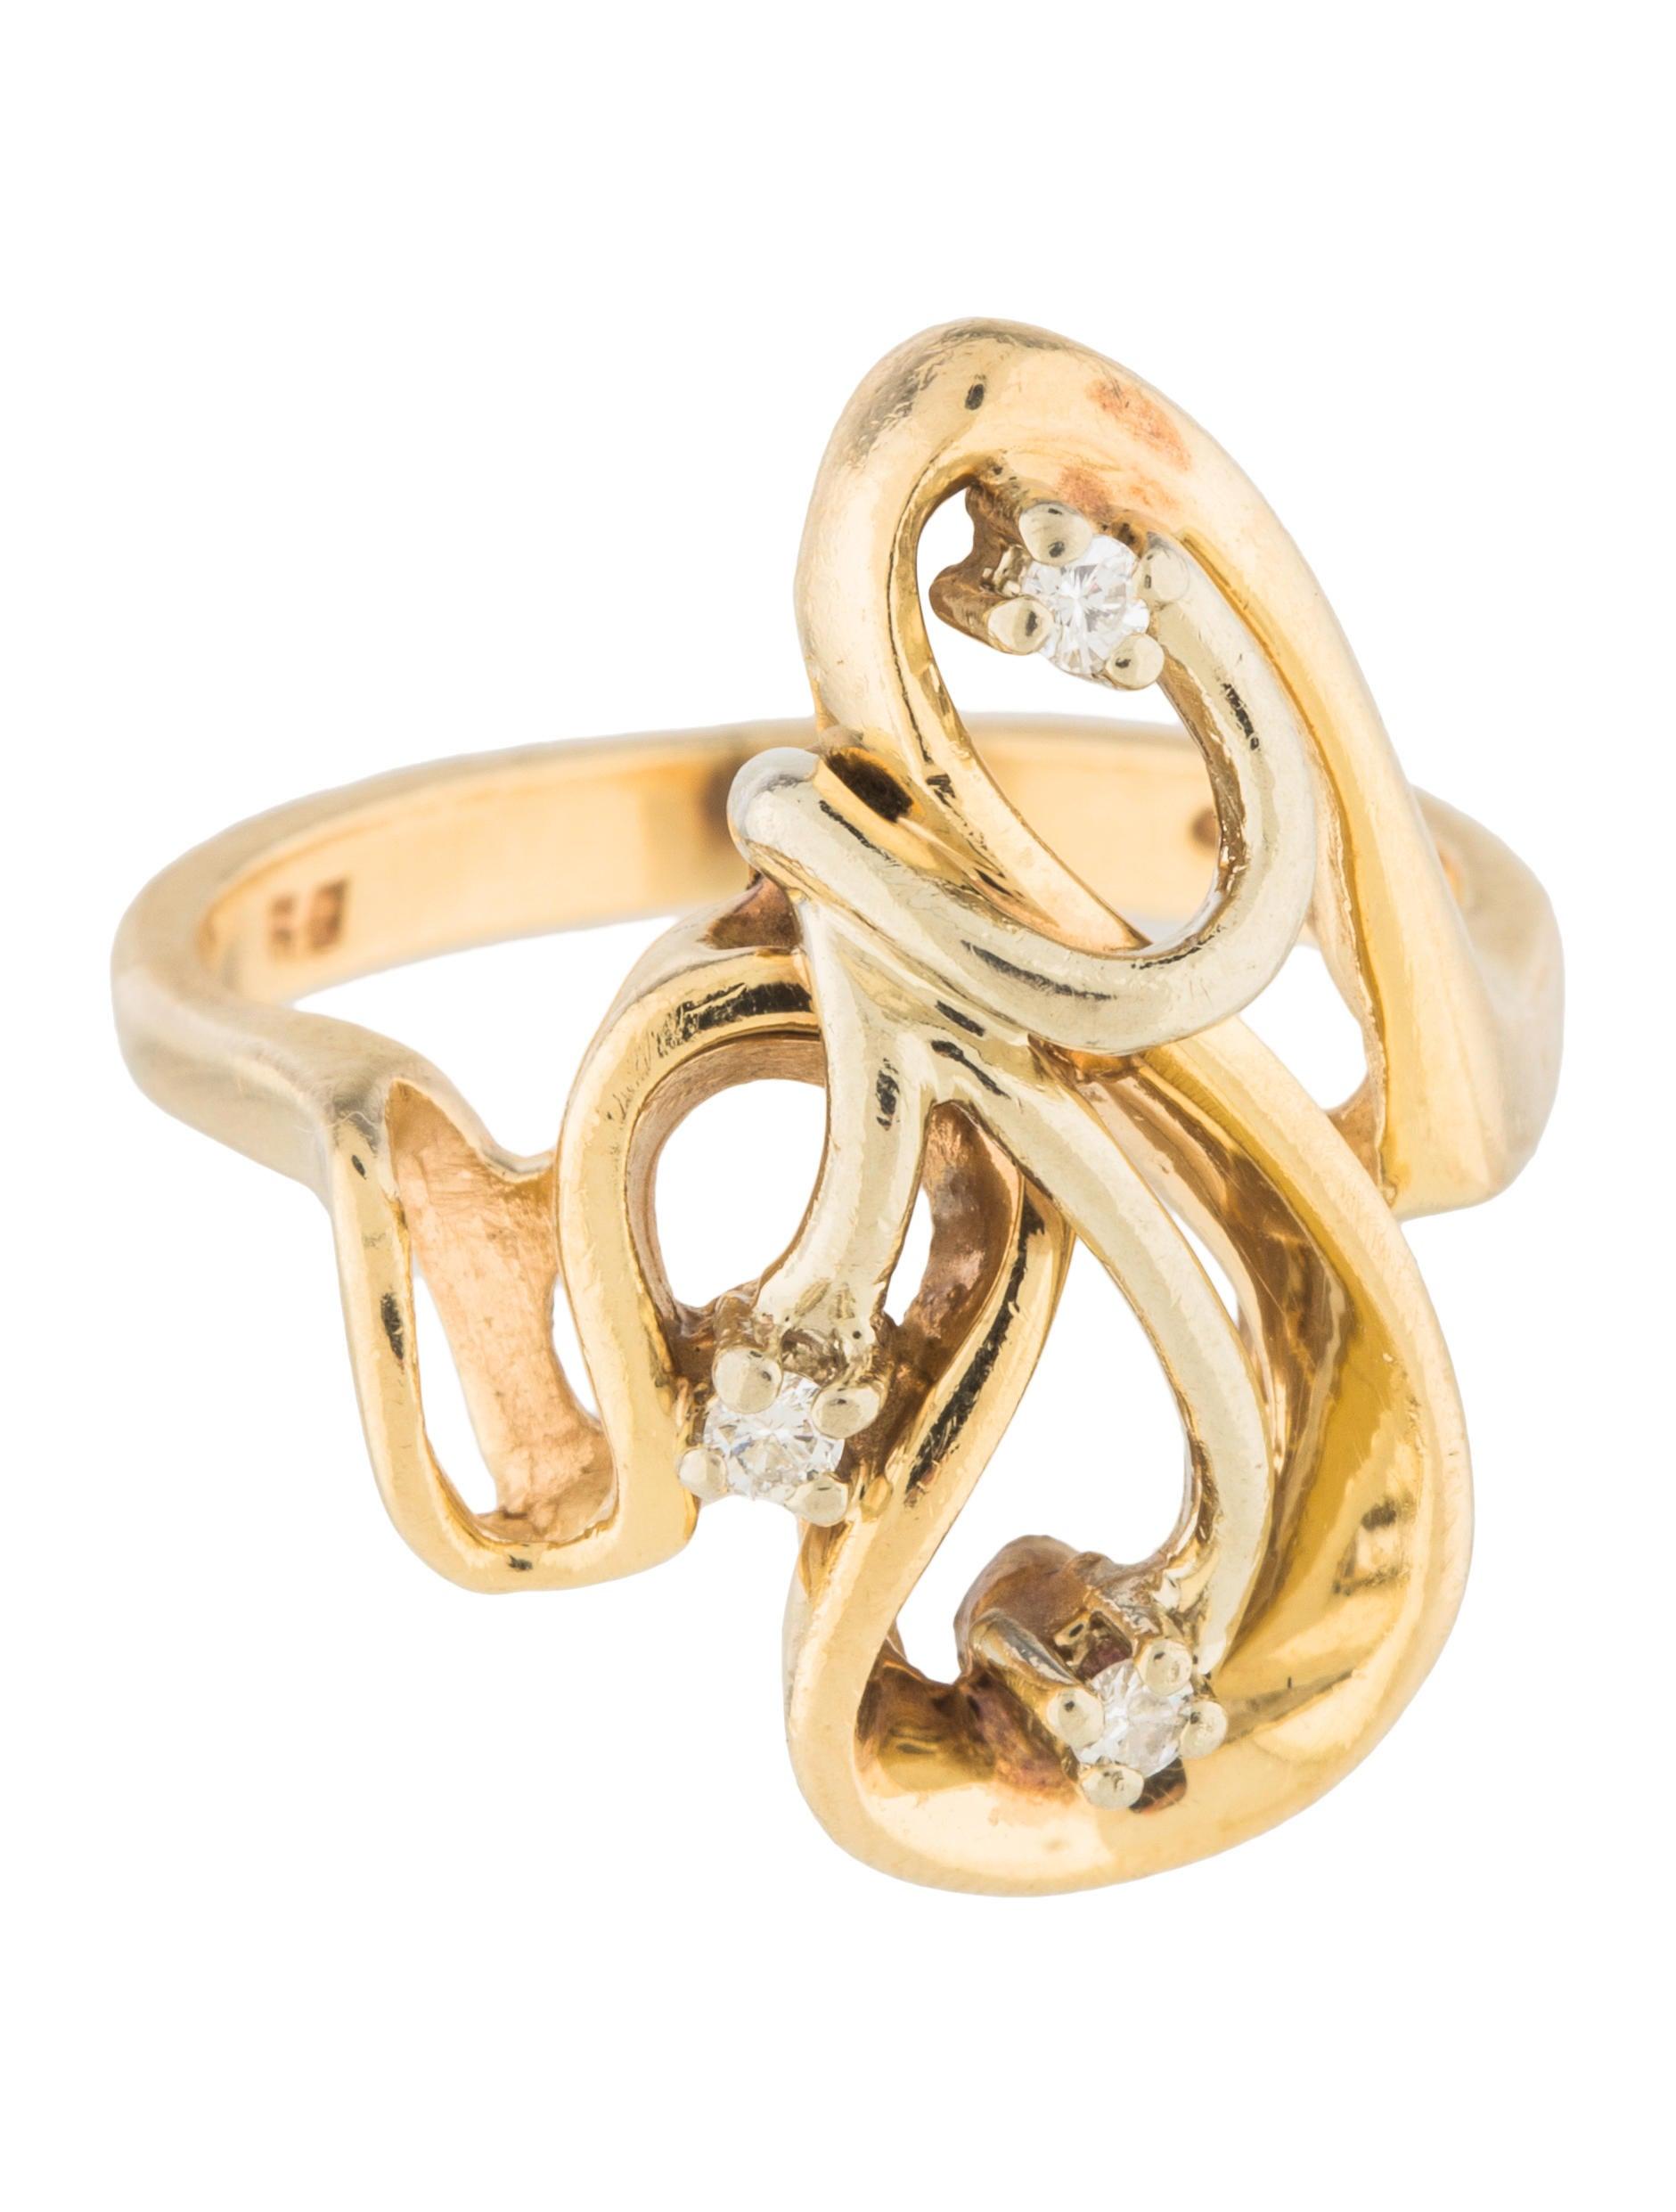 Carat Diamond Cocktail Ring